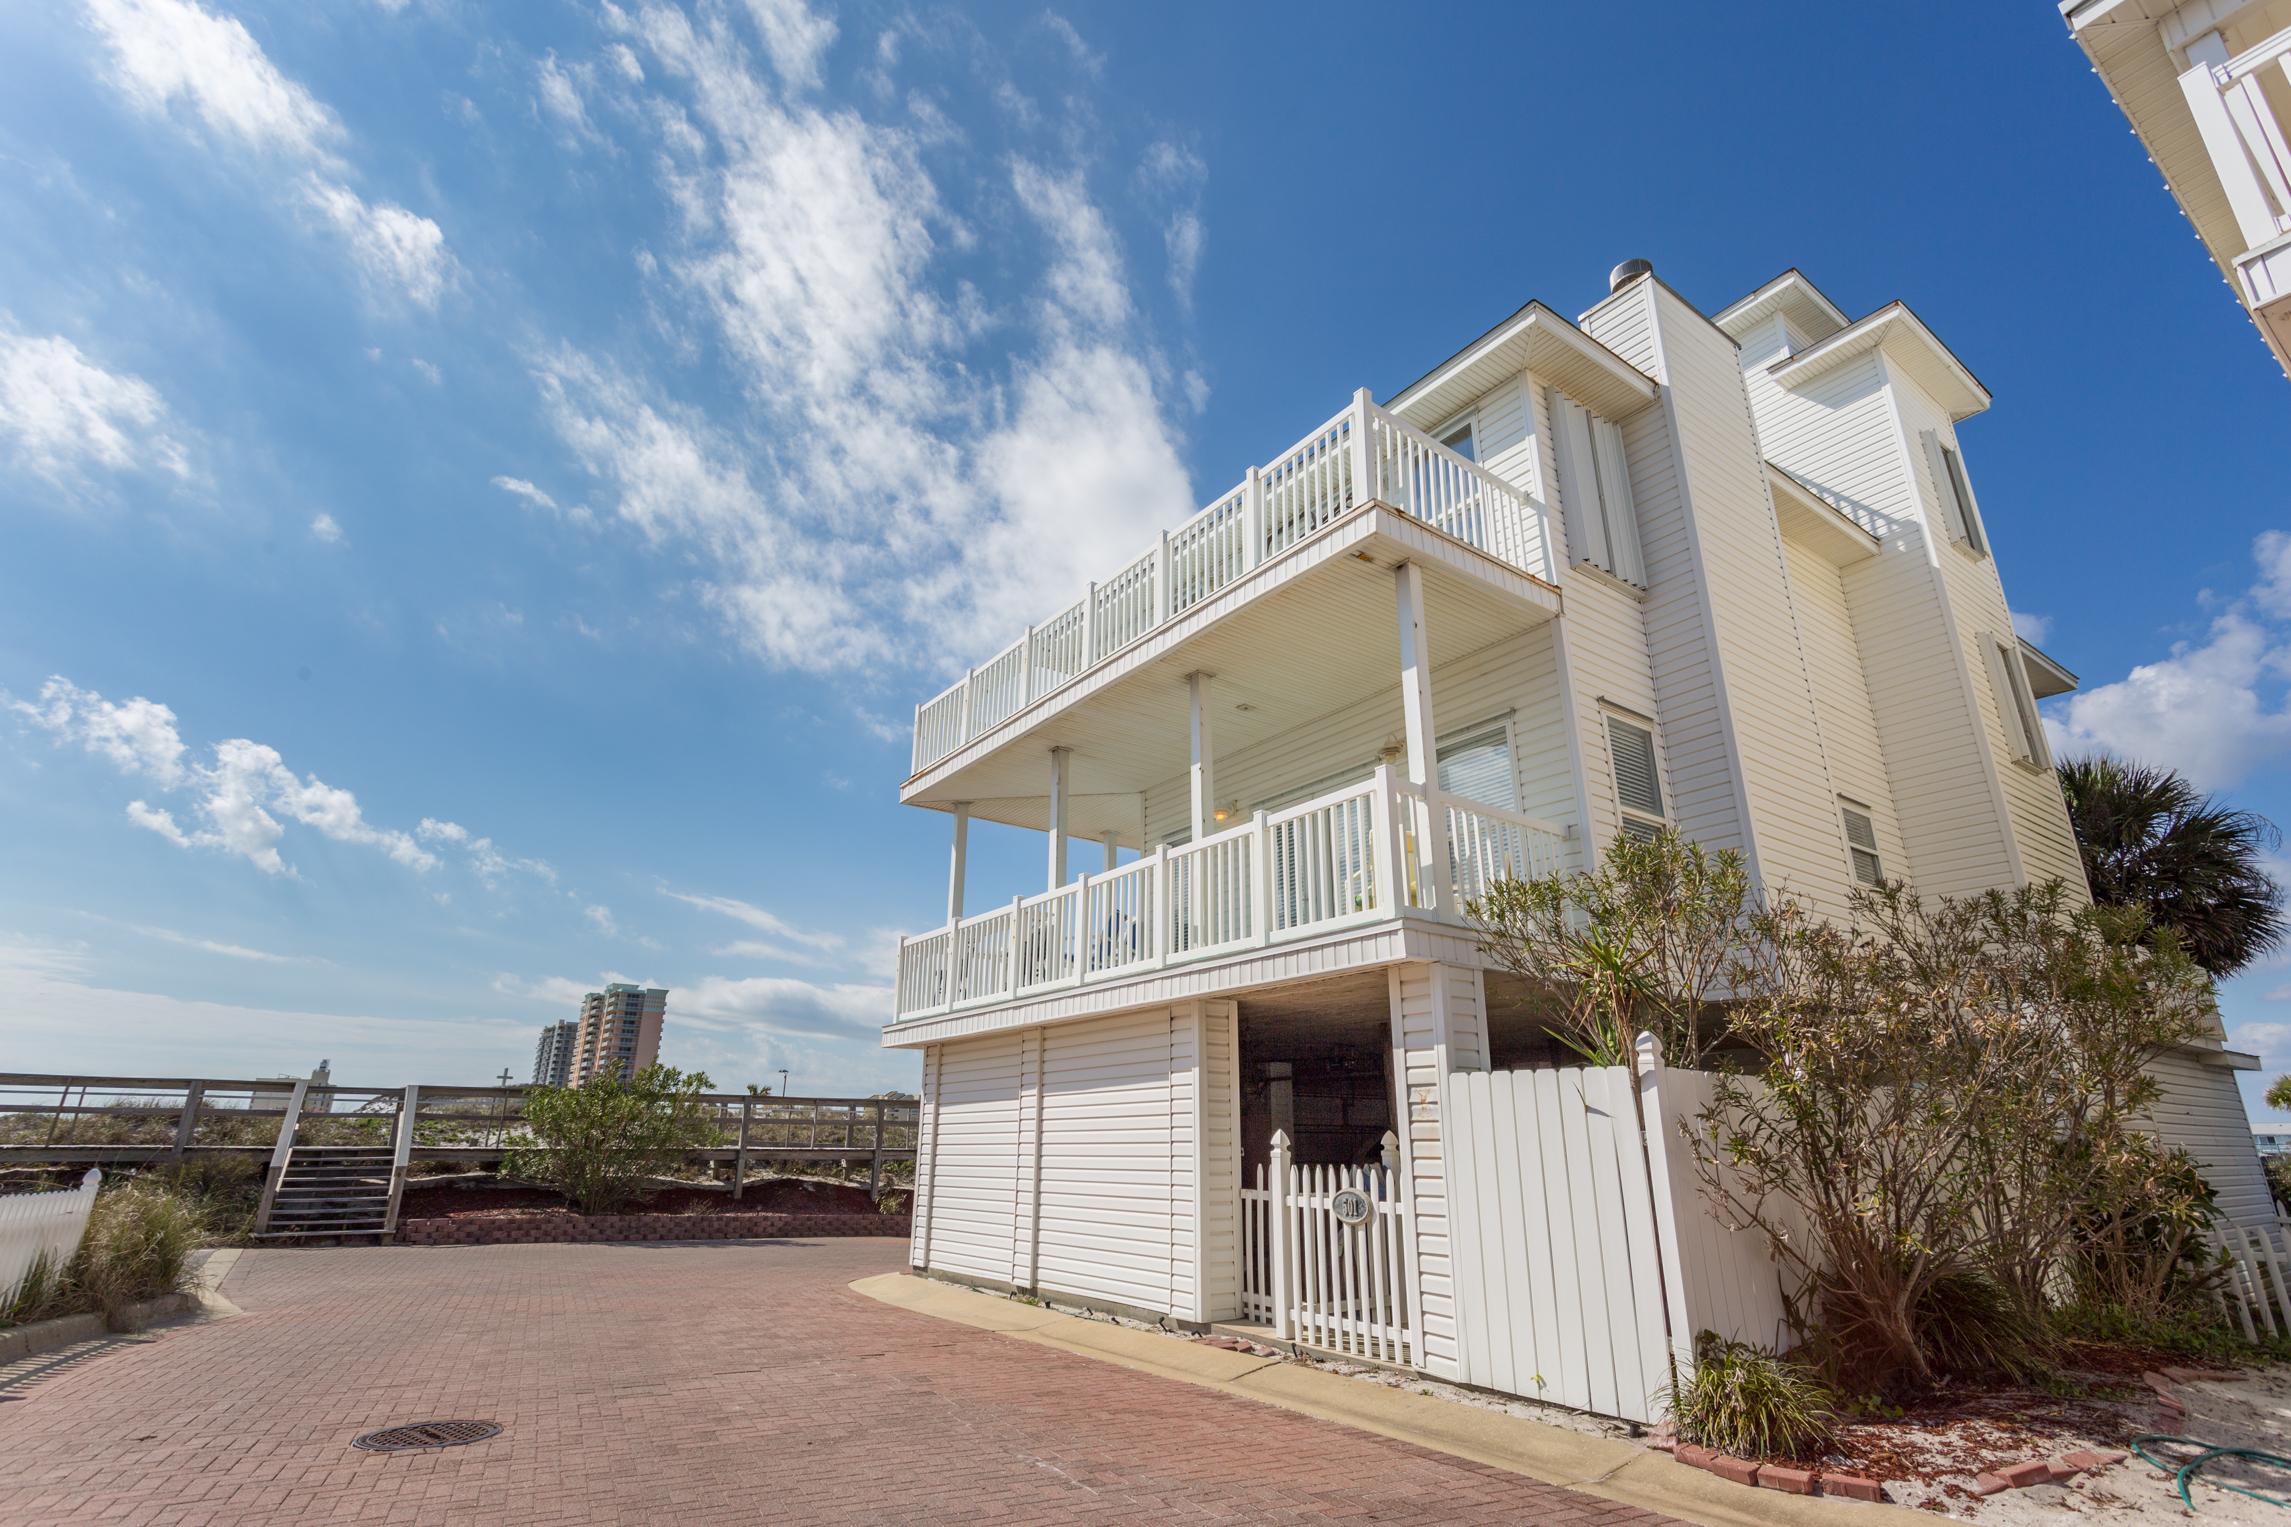 White Sands Cottage 501 Life's a Beach House Townhouse rental in White Sands Pensacola Beach in Pensacola Beach Florida - #45